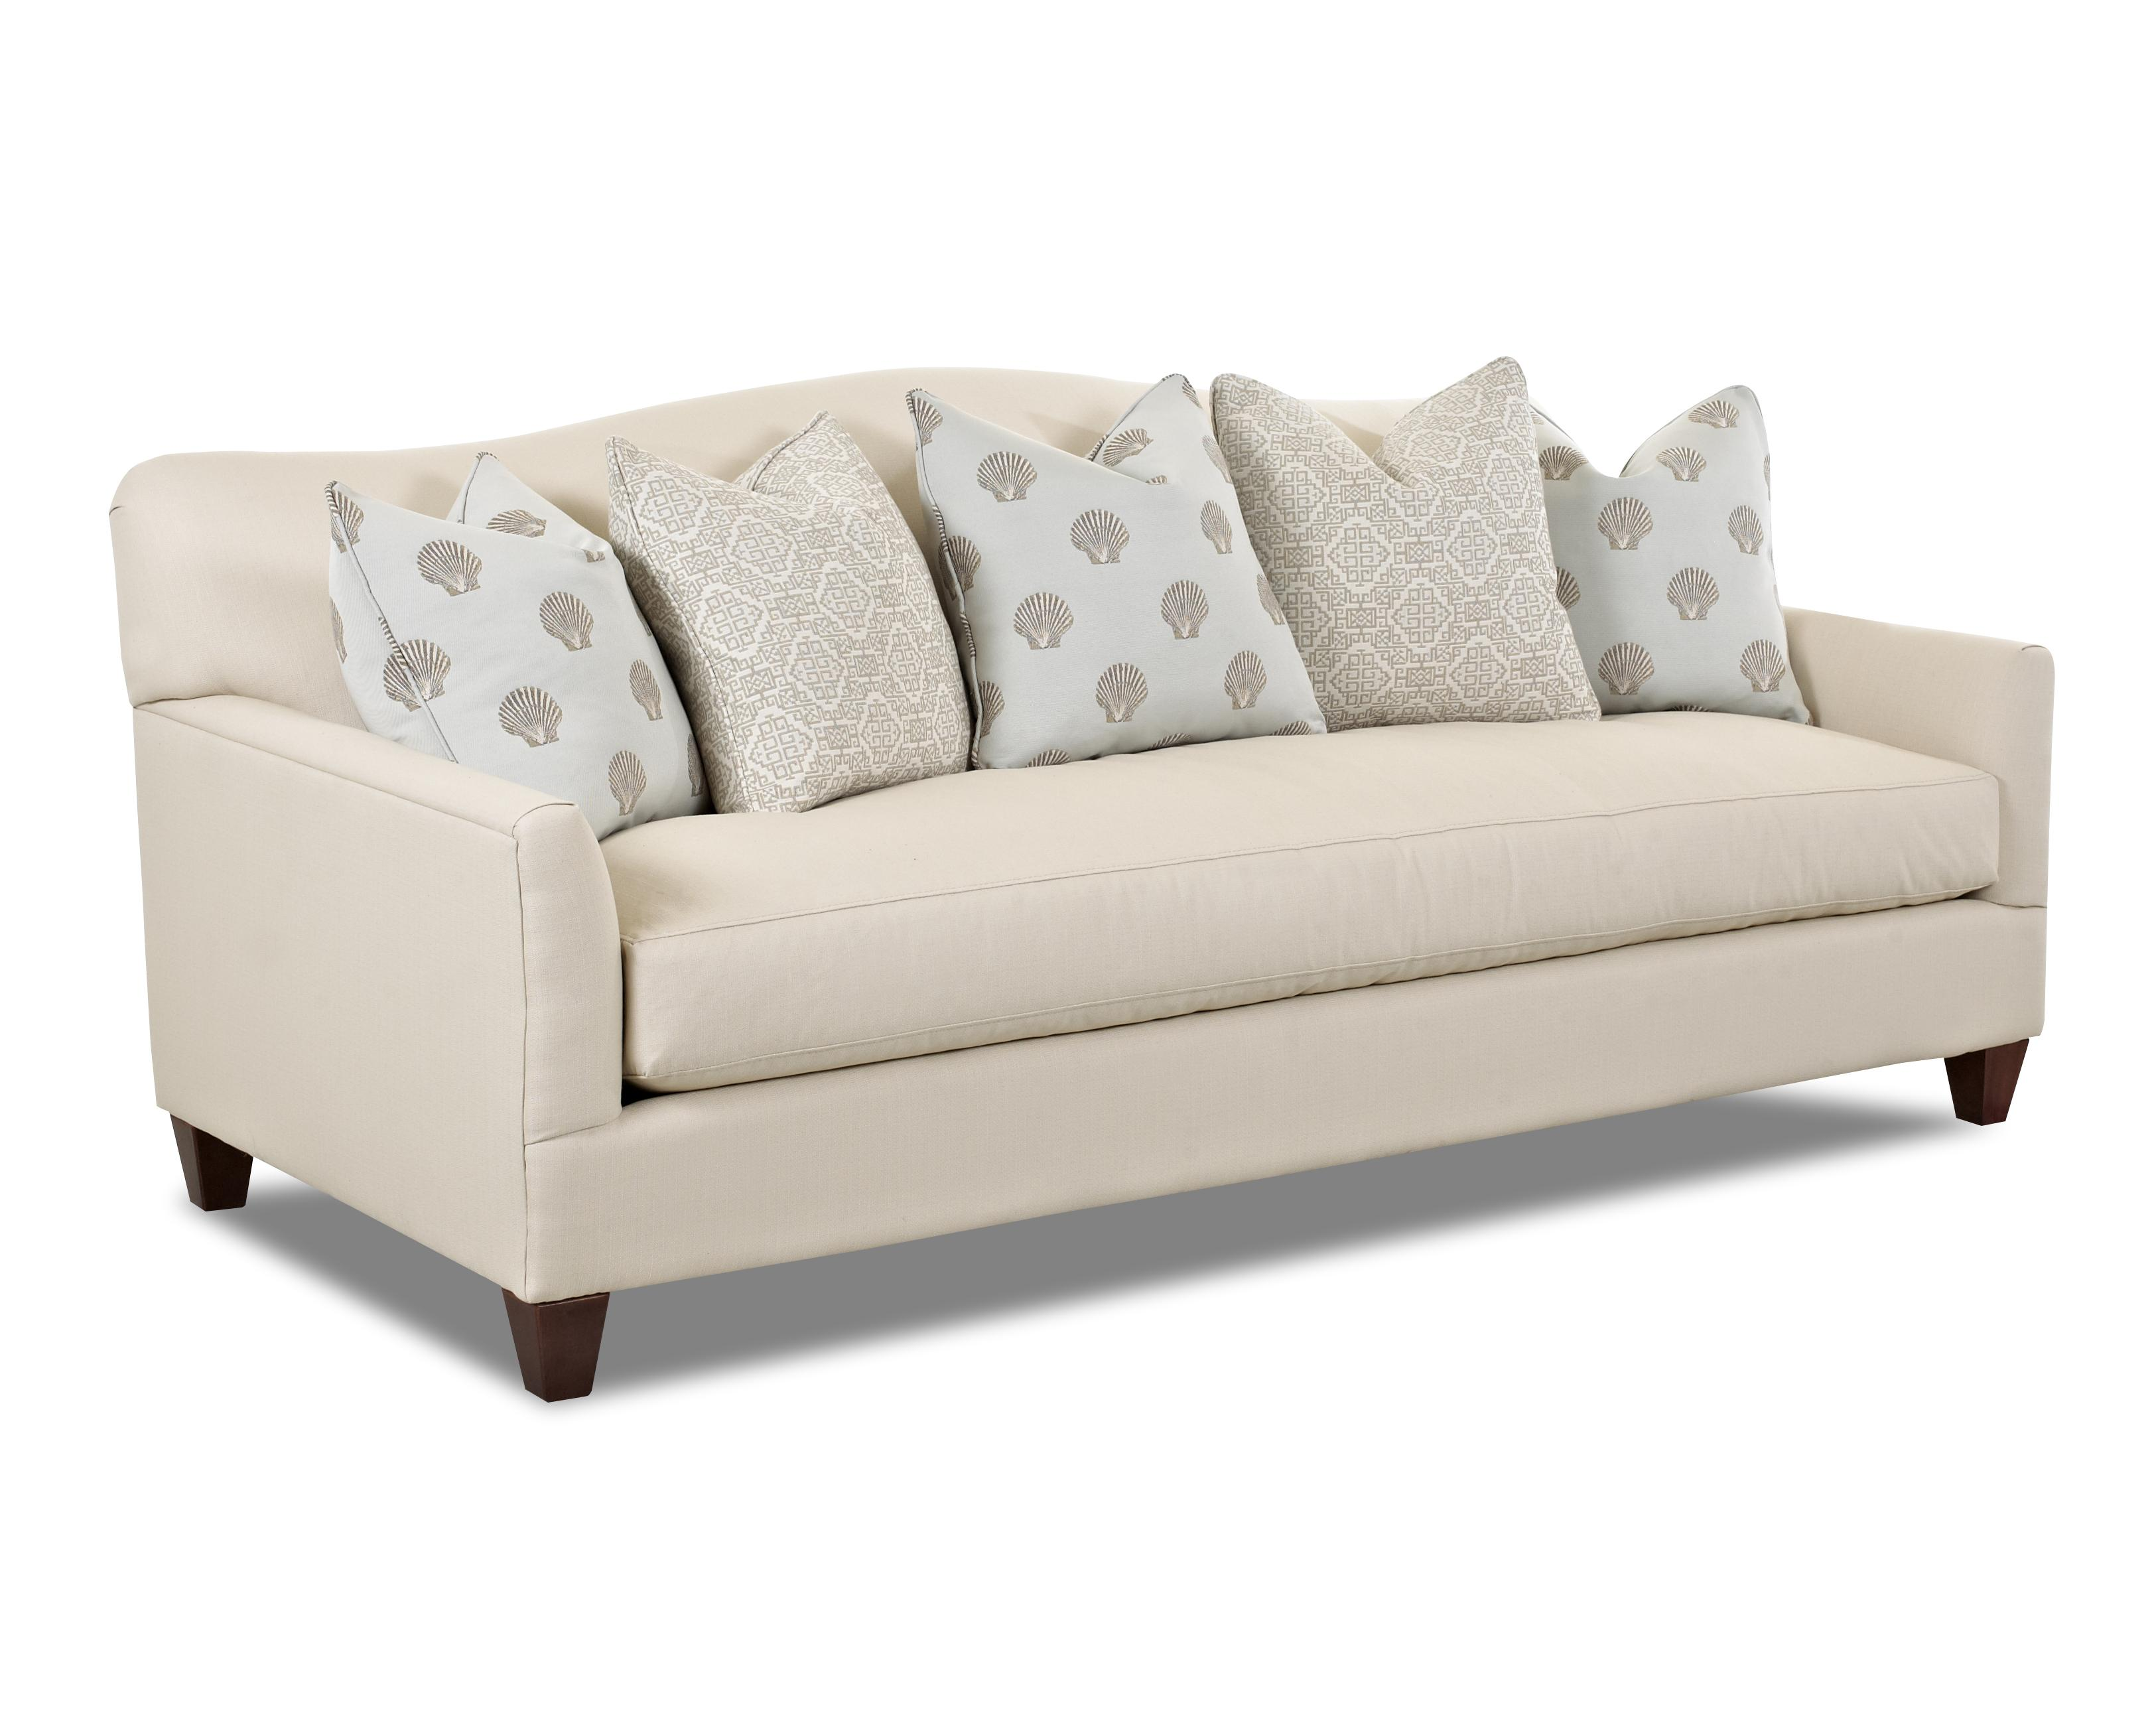 Sofa Bench sofa